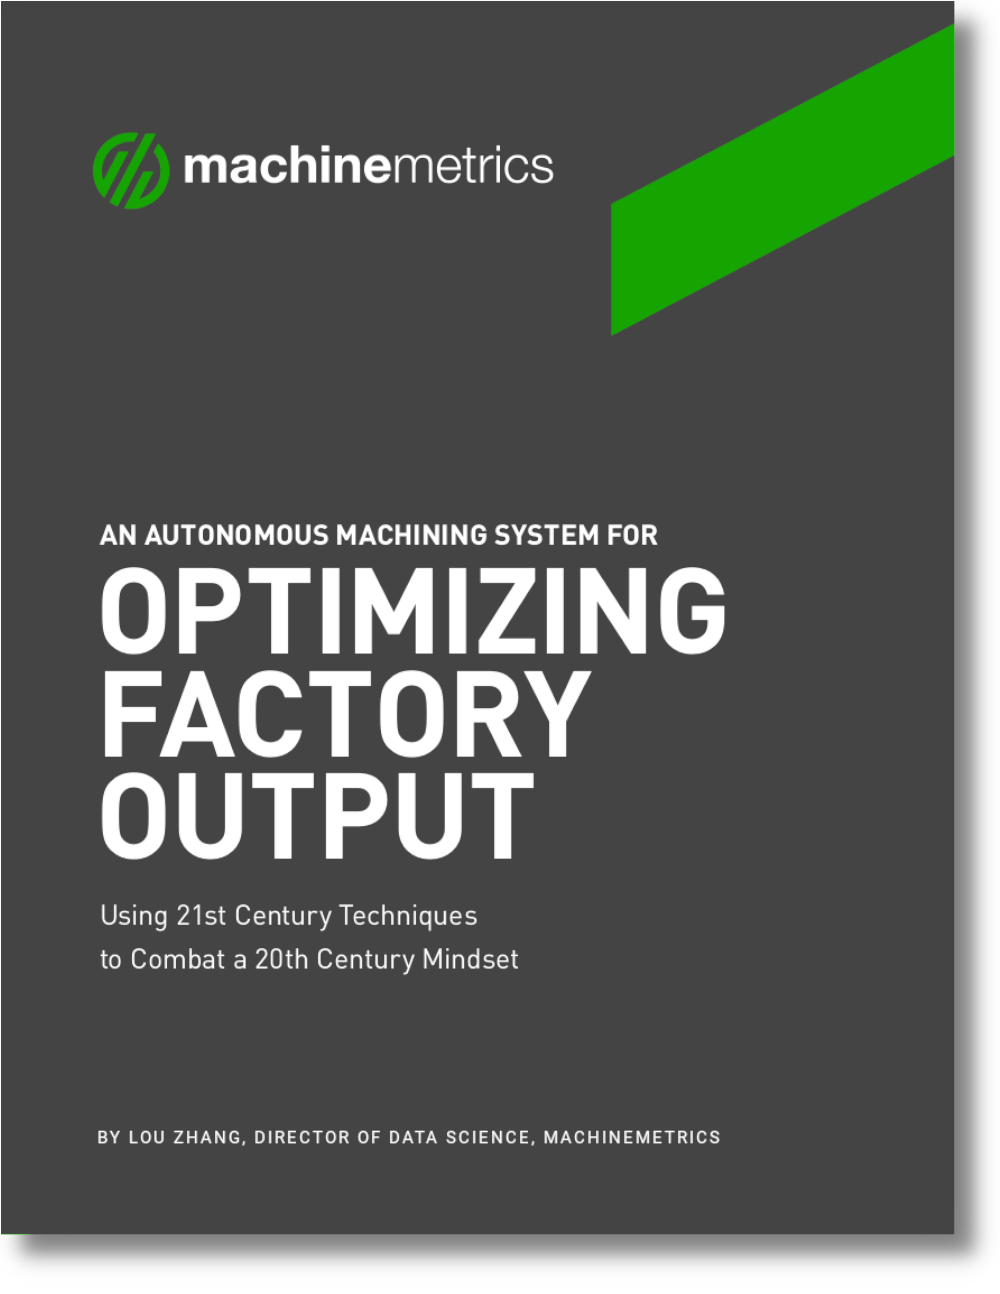 An Autonomous Machining System for Optimizing Factory Output